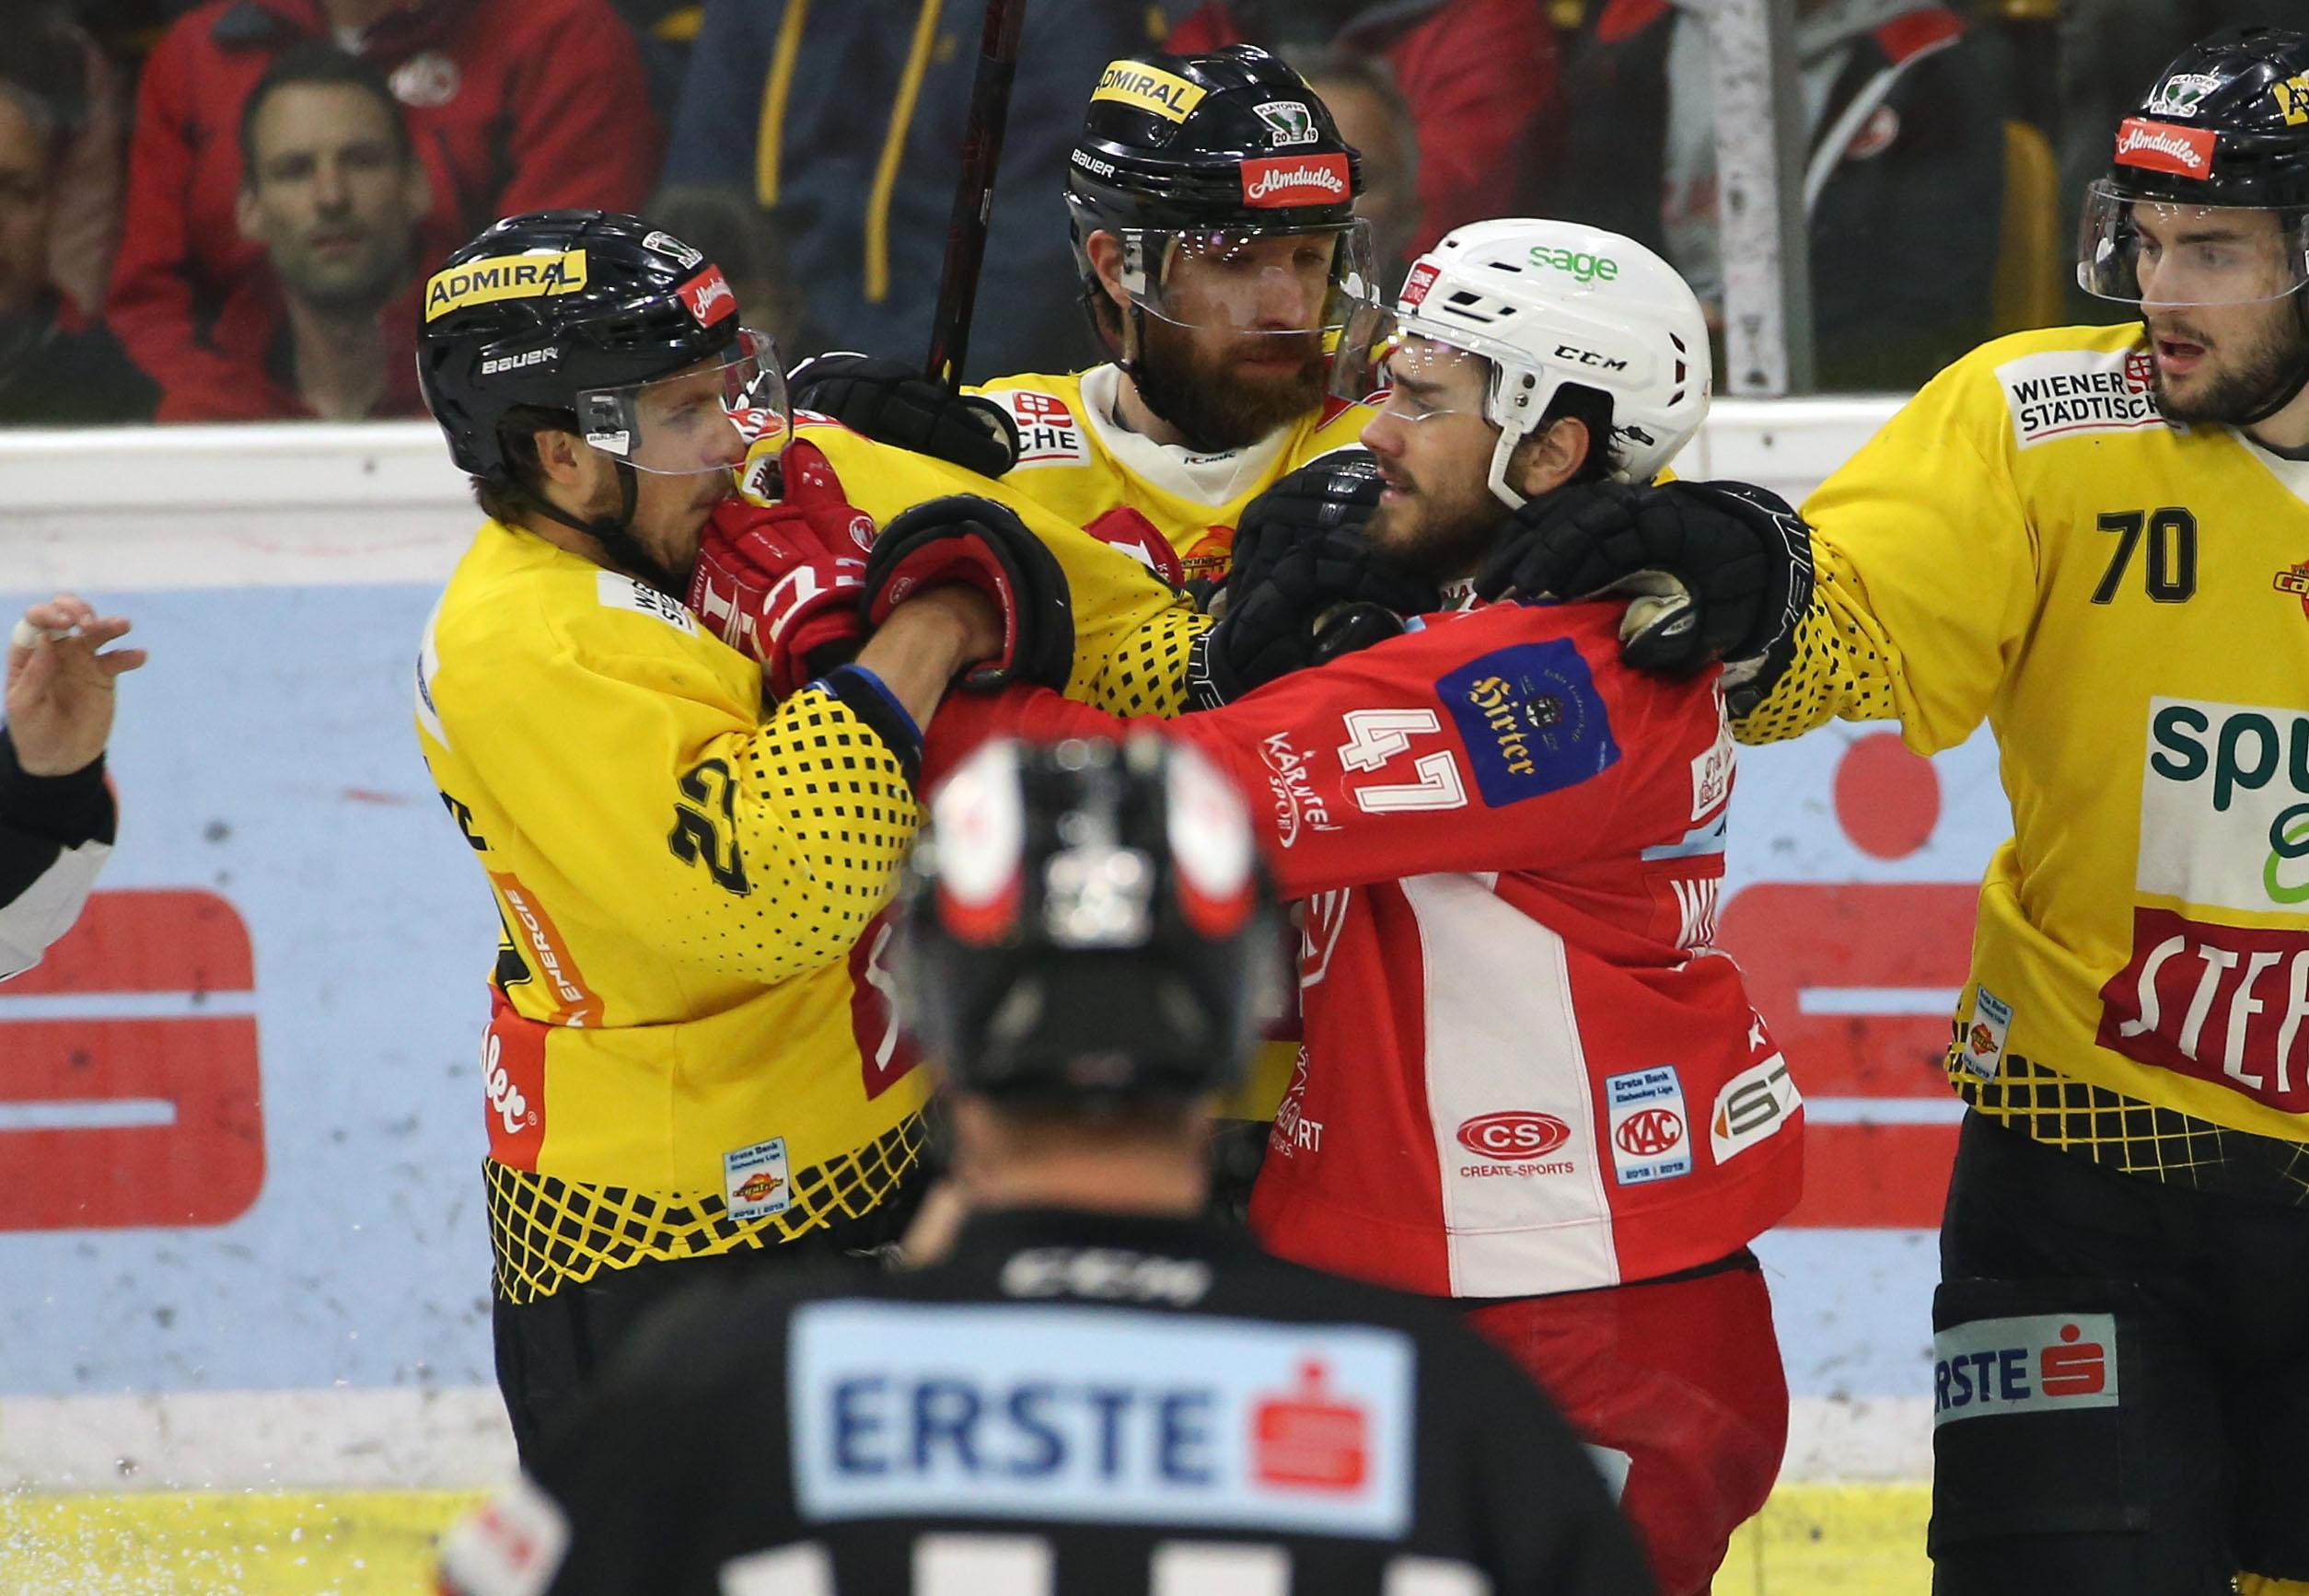 EBEL. Eishockey Bundesliga. KAC gegen spusu Vienna Capitals. Marcel Witting, (KAC), Julian Grosslercher (Vienna Capitals). Klagenfurt, am 24.4.2019. Foto: Kuess